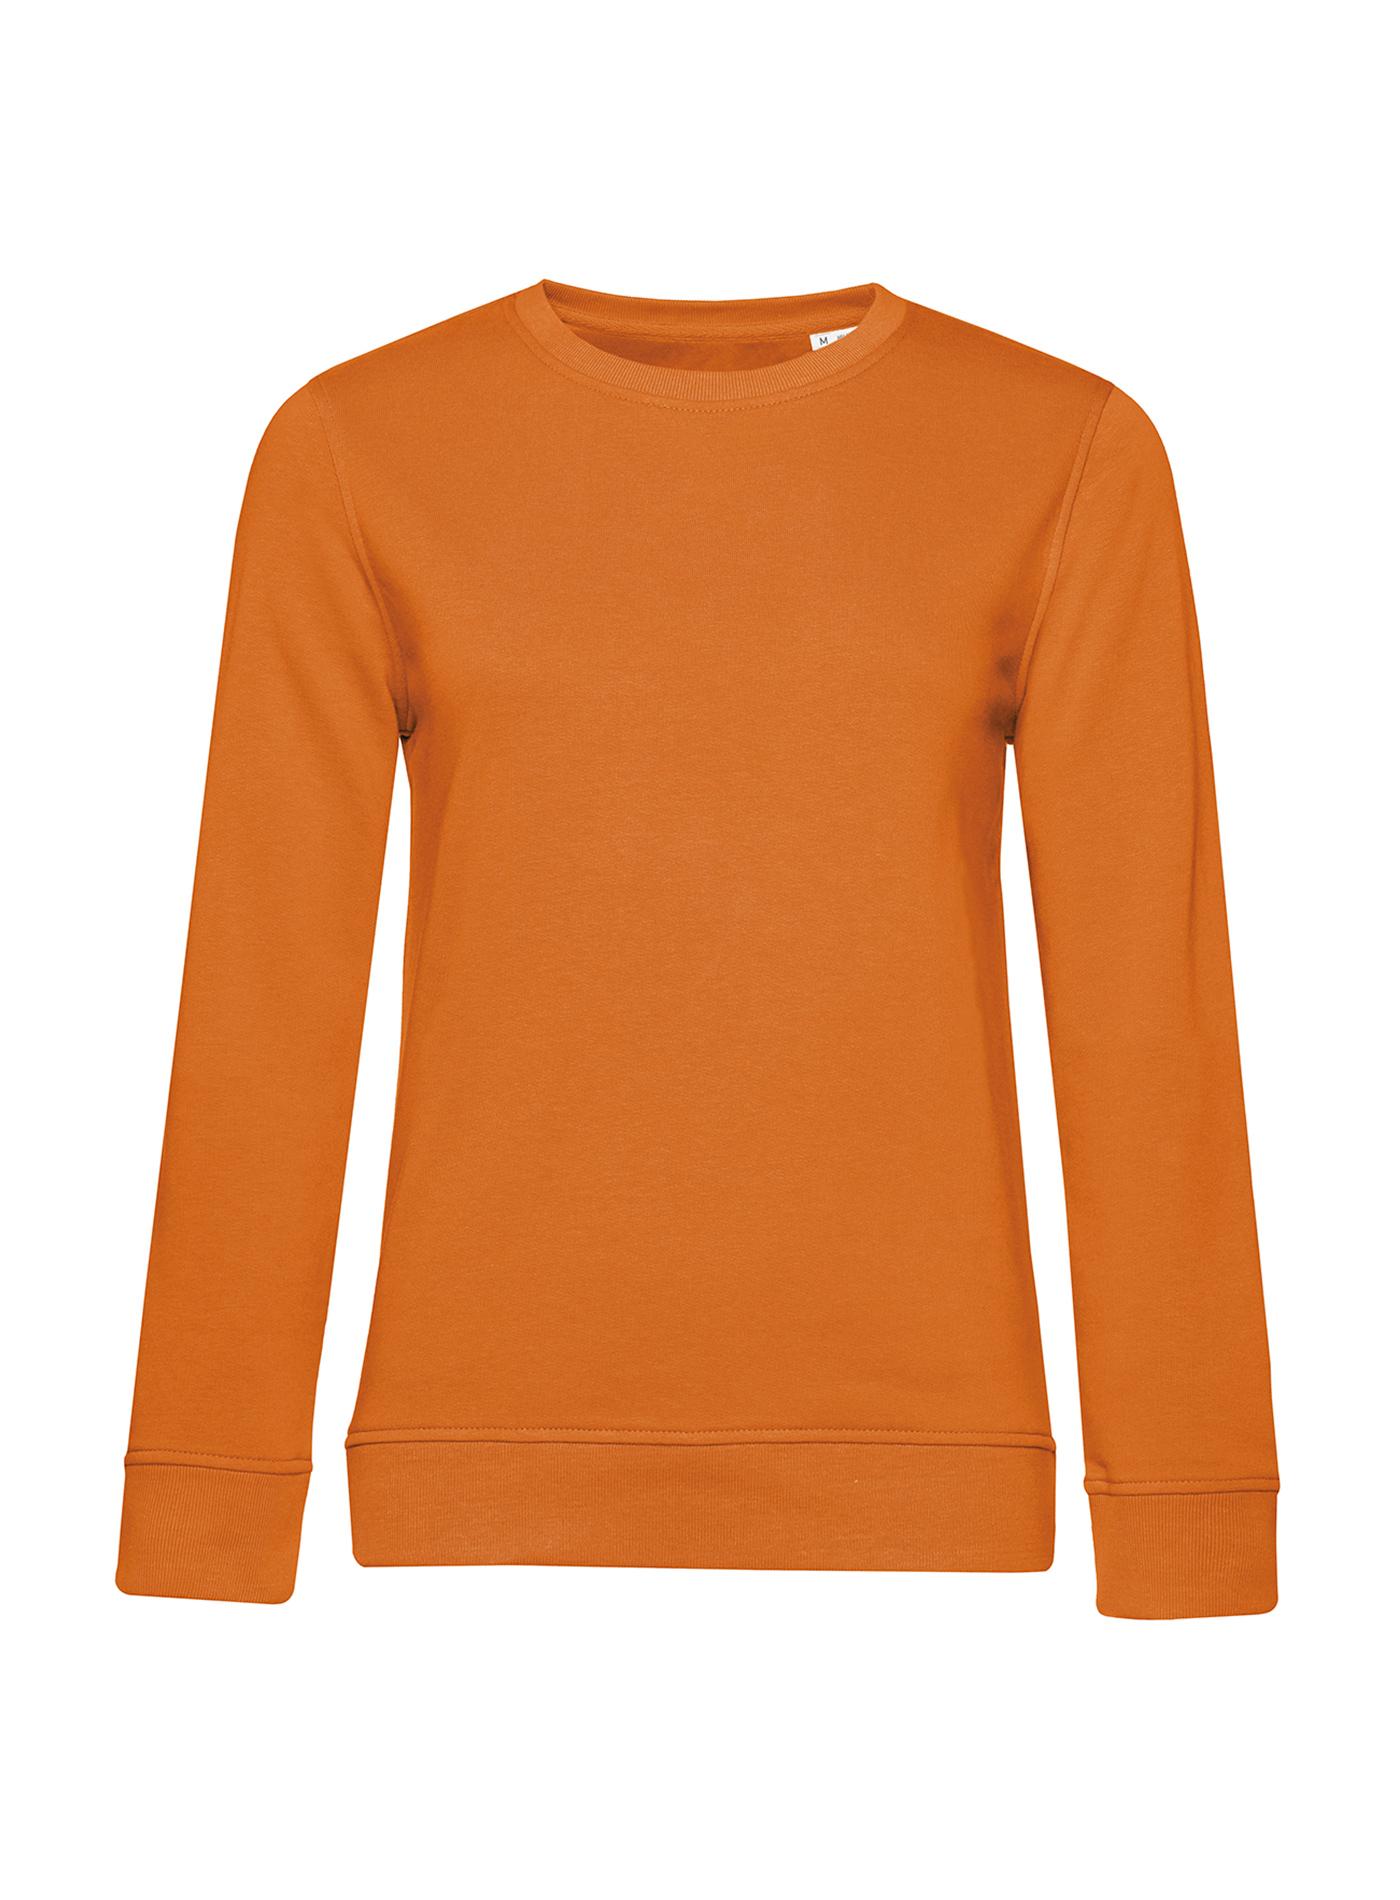 Dámská mikina Organic Crew - Oranžová XXL